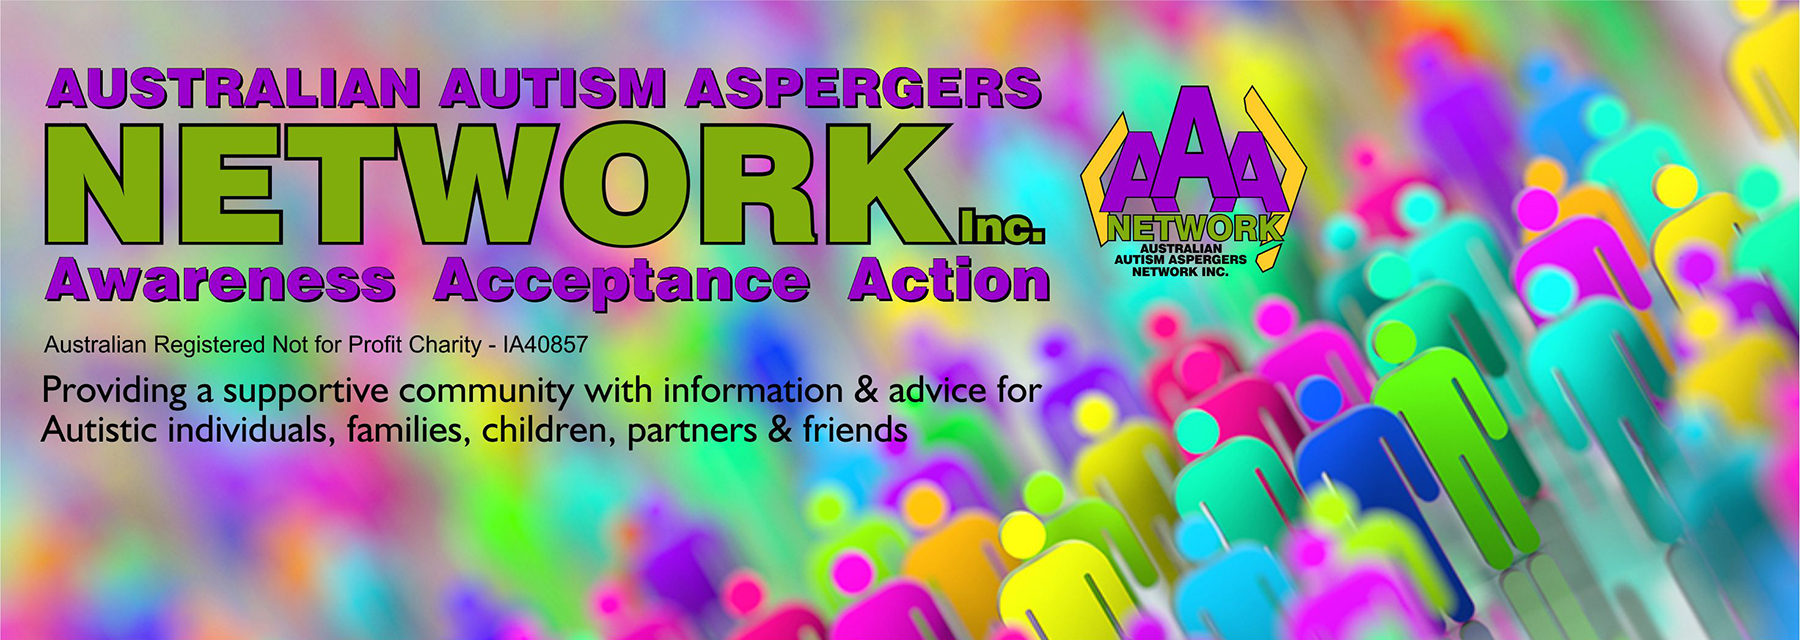 Australian Autism Aspergers Network Inc